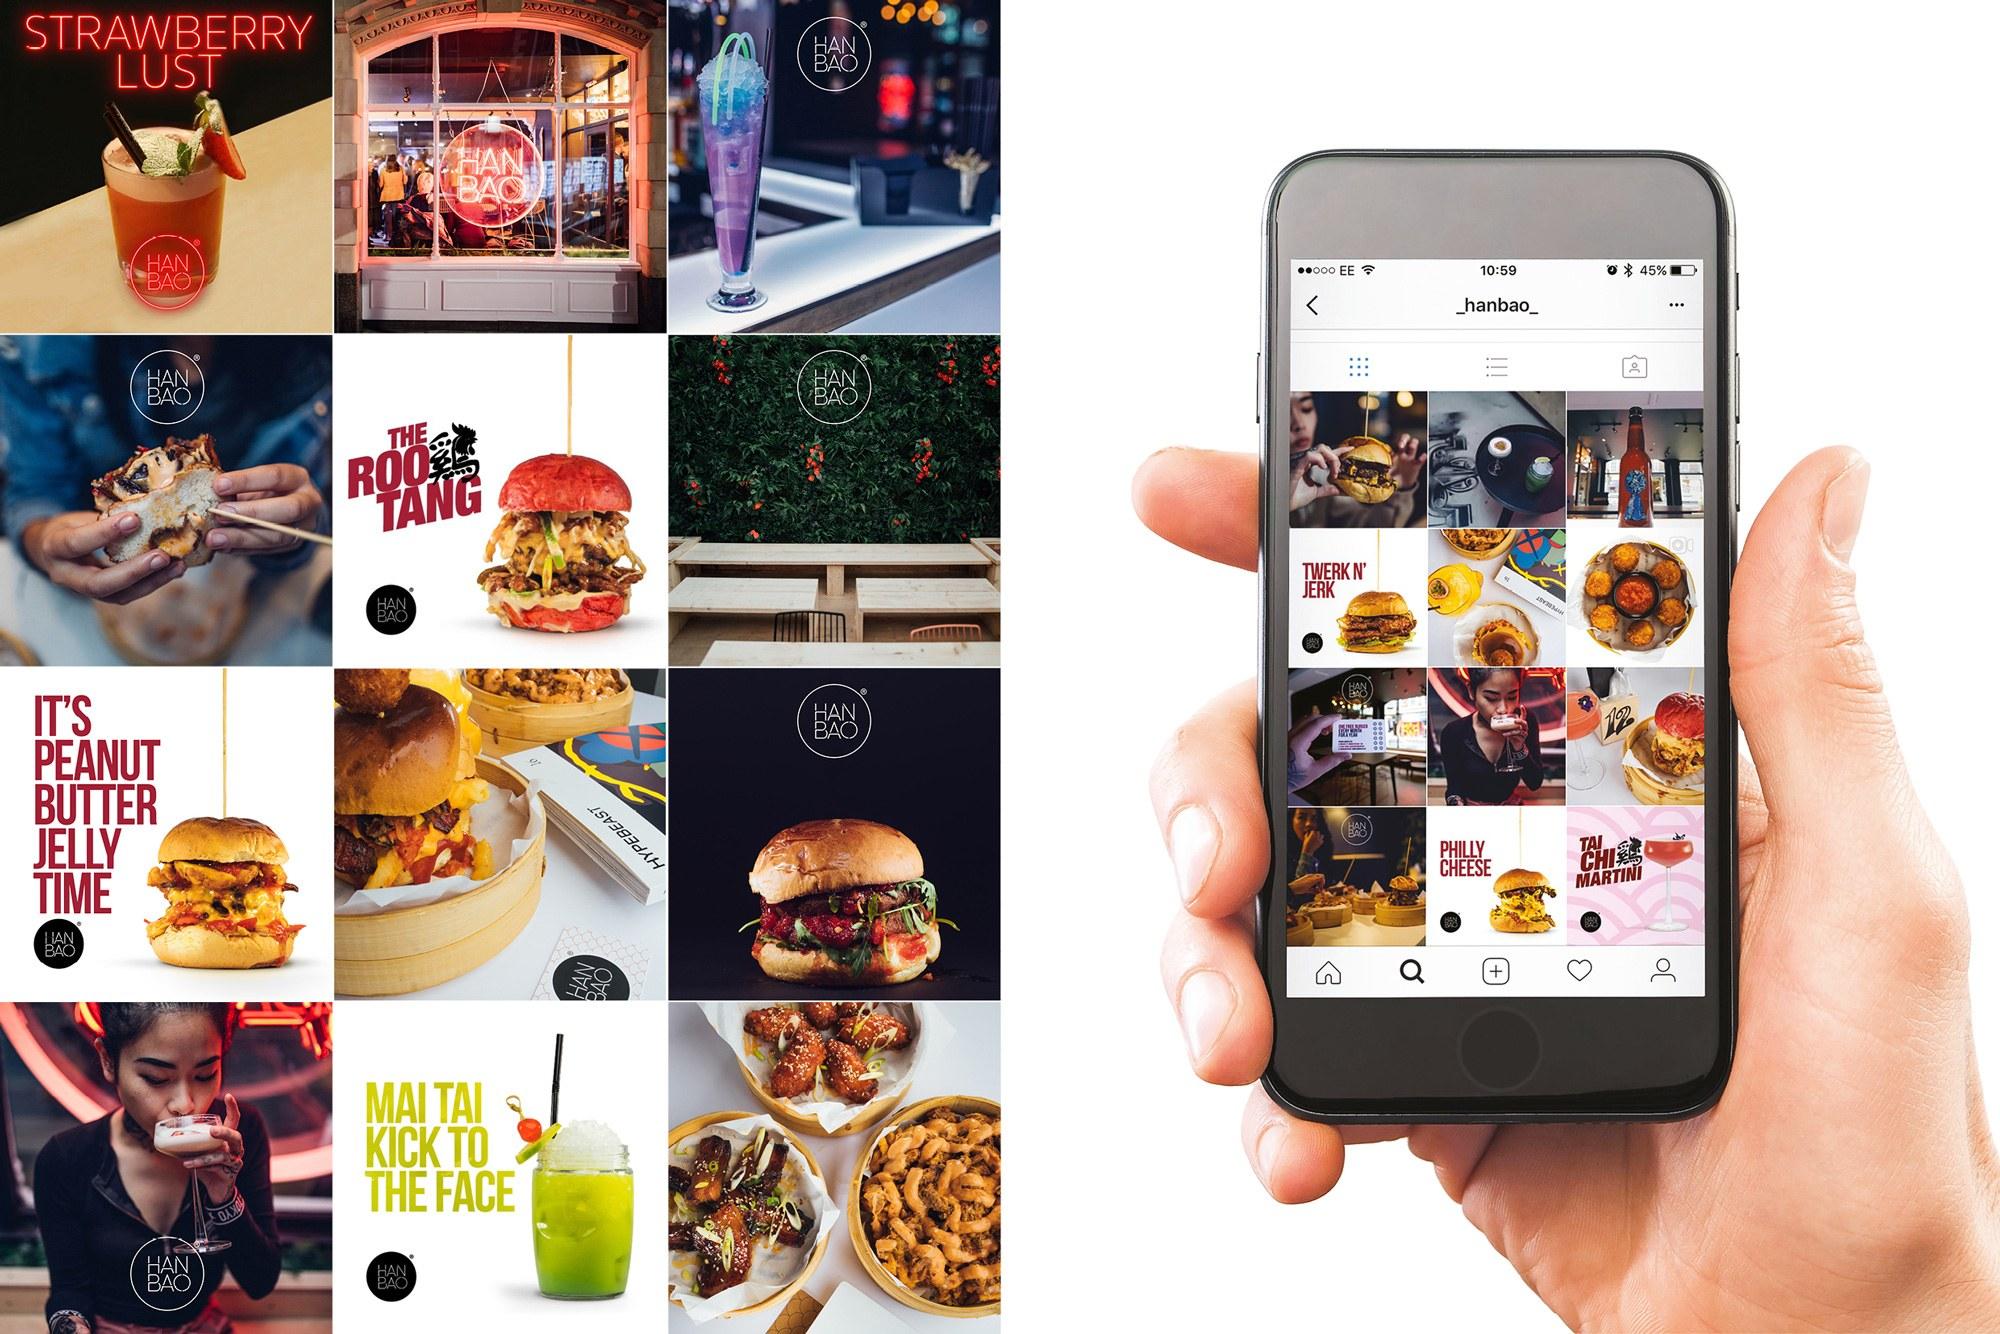 Hanbao Social Media Marketing